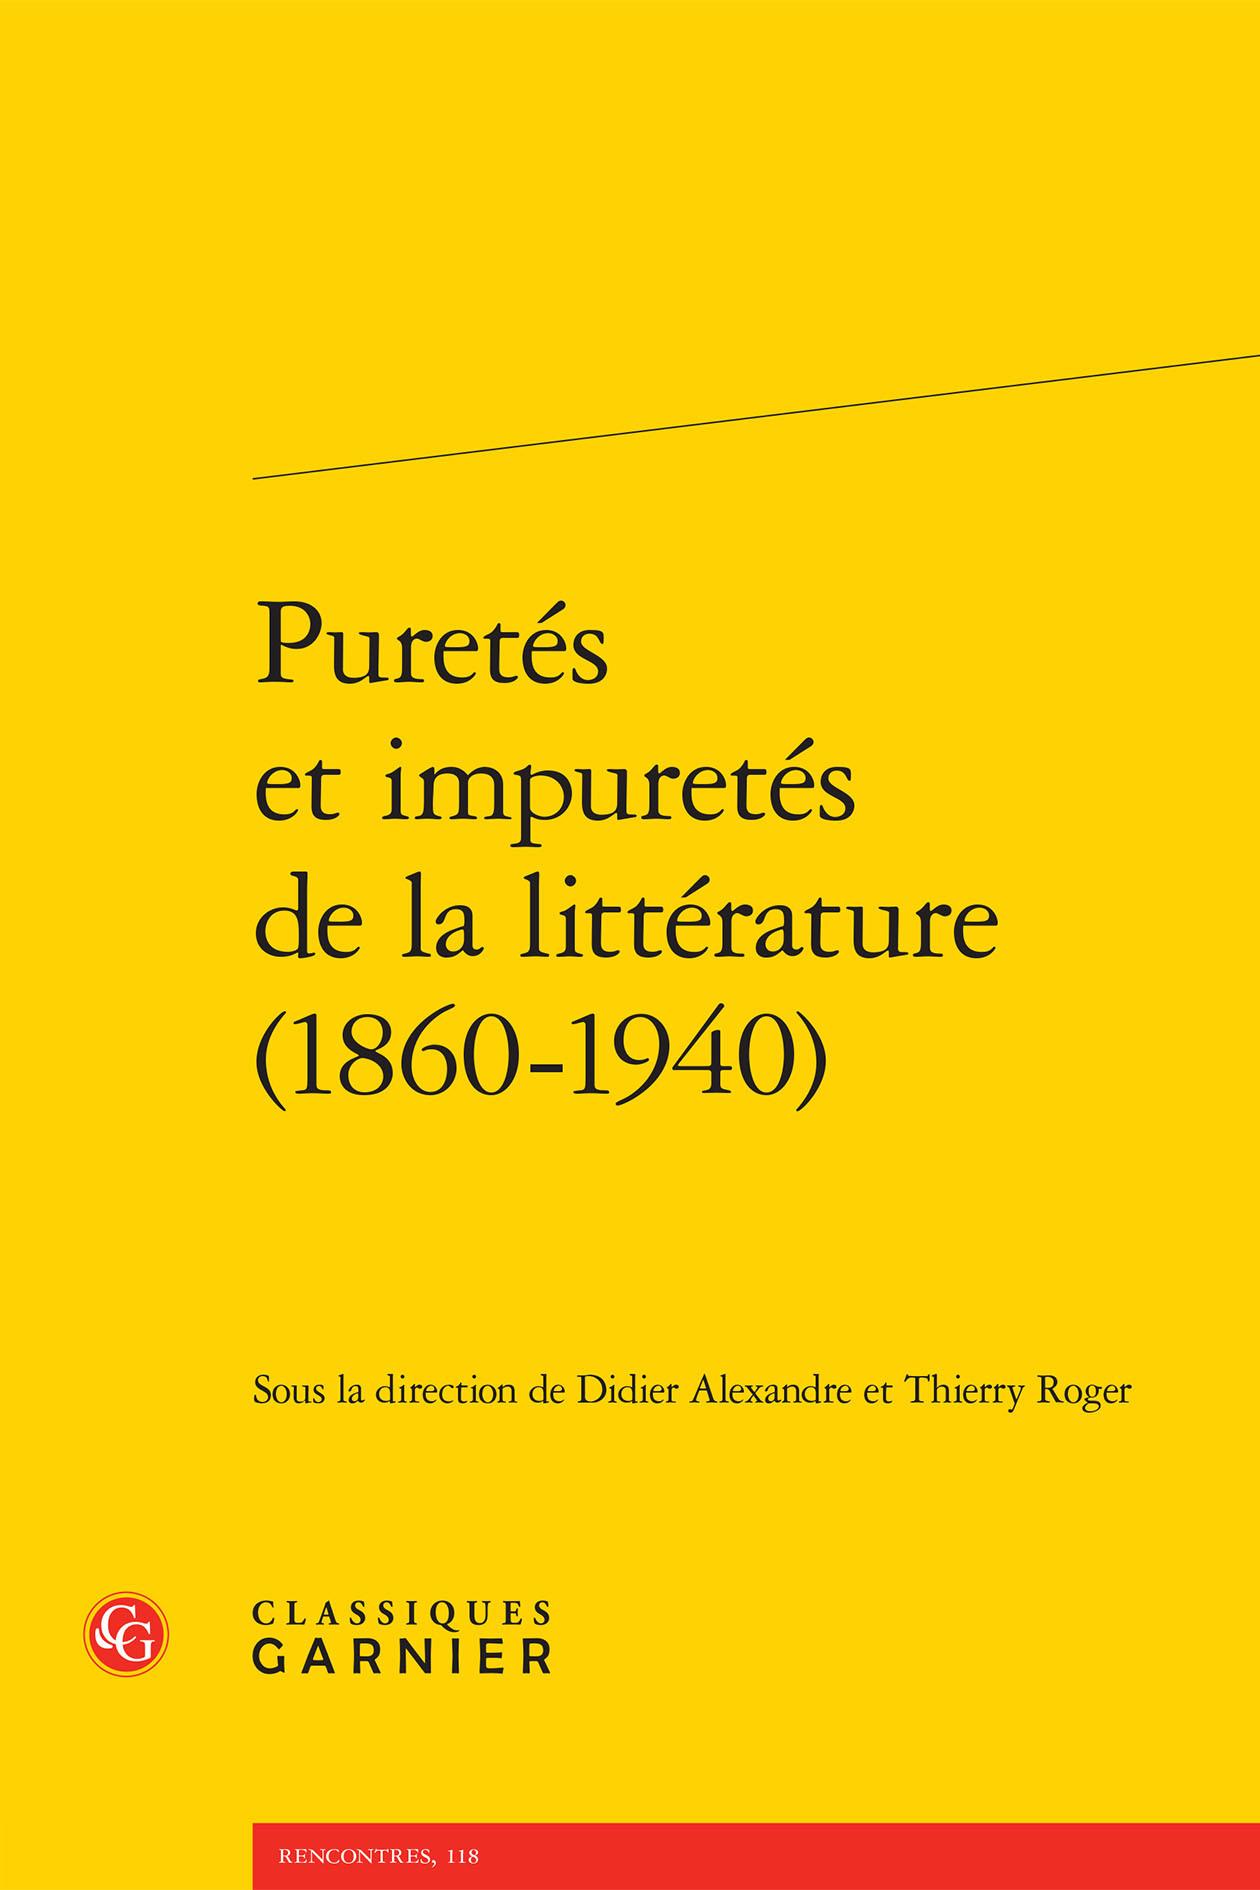 PURETES ET IMPURETES DE LA LITTERATURE (1860-1940)